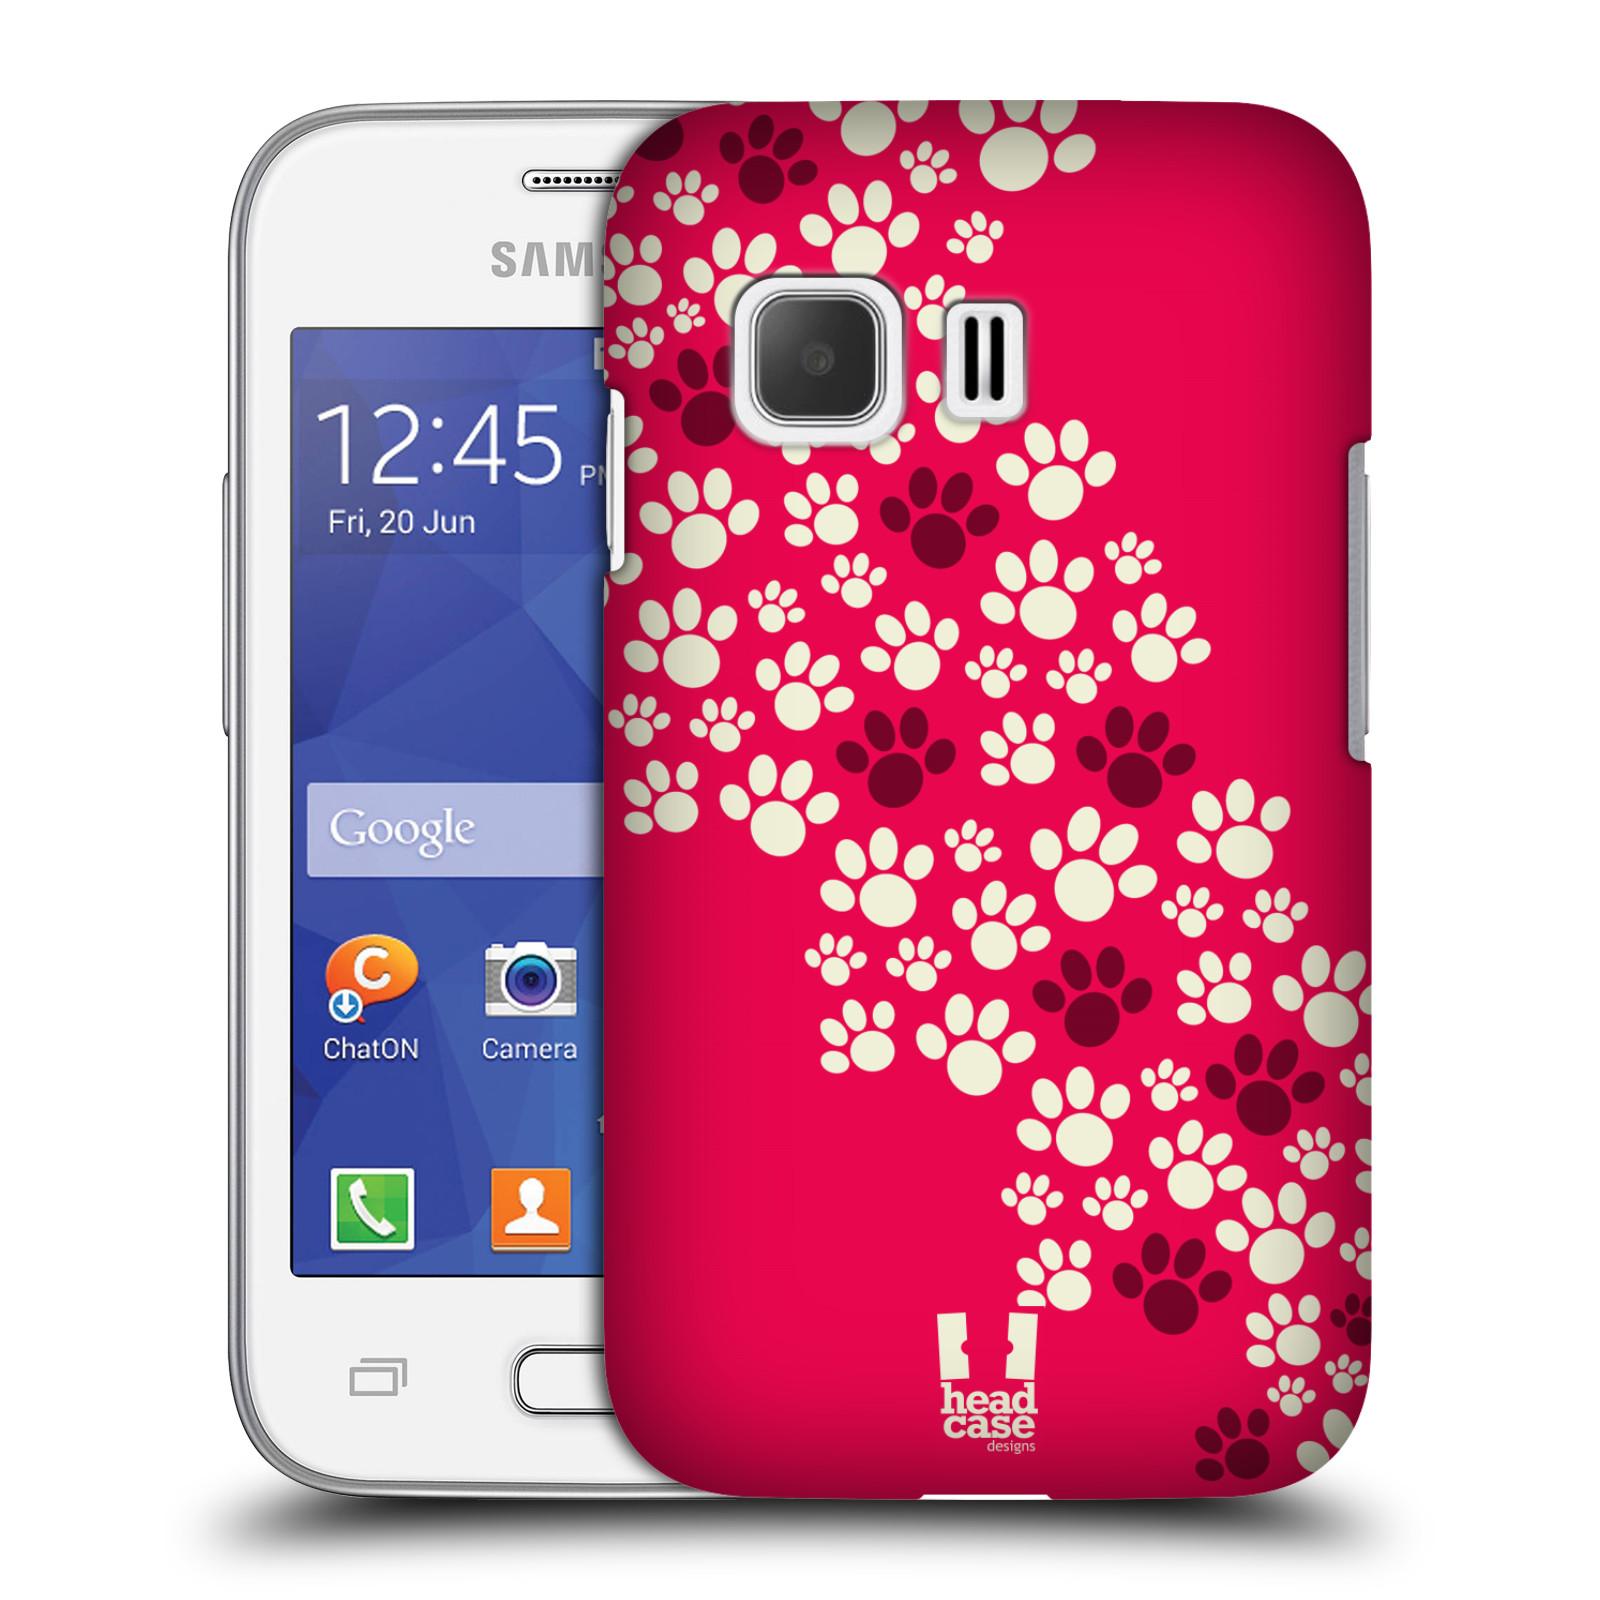 Plastové pouzdro na mobil Samsung Galaxy Young 2 HEAD CASE TLAPKY RŮŽOVÉ (Kryt či obal na mobilní telefon Samsung Galaxy Young 2 SM-G130)